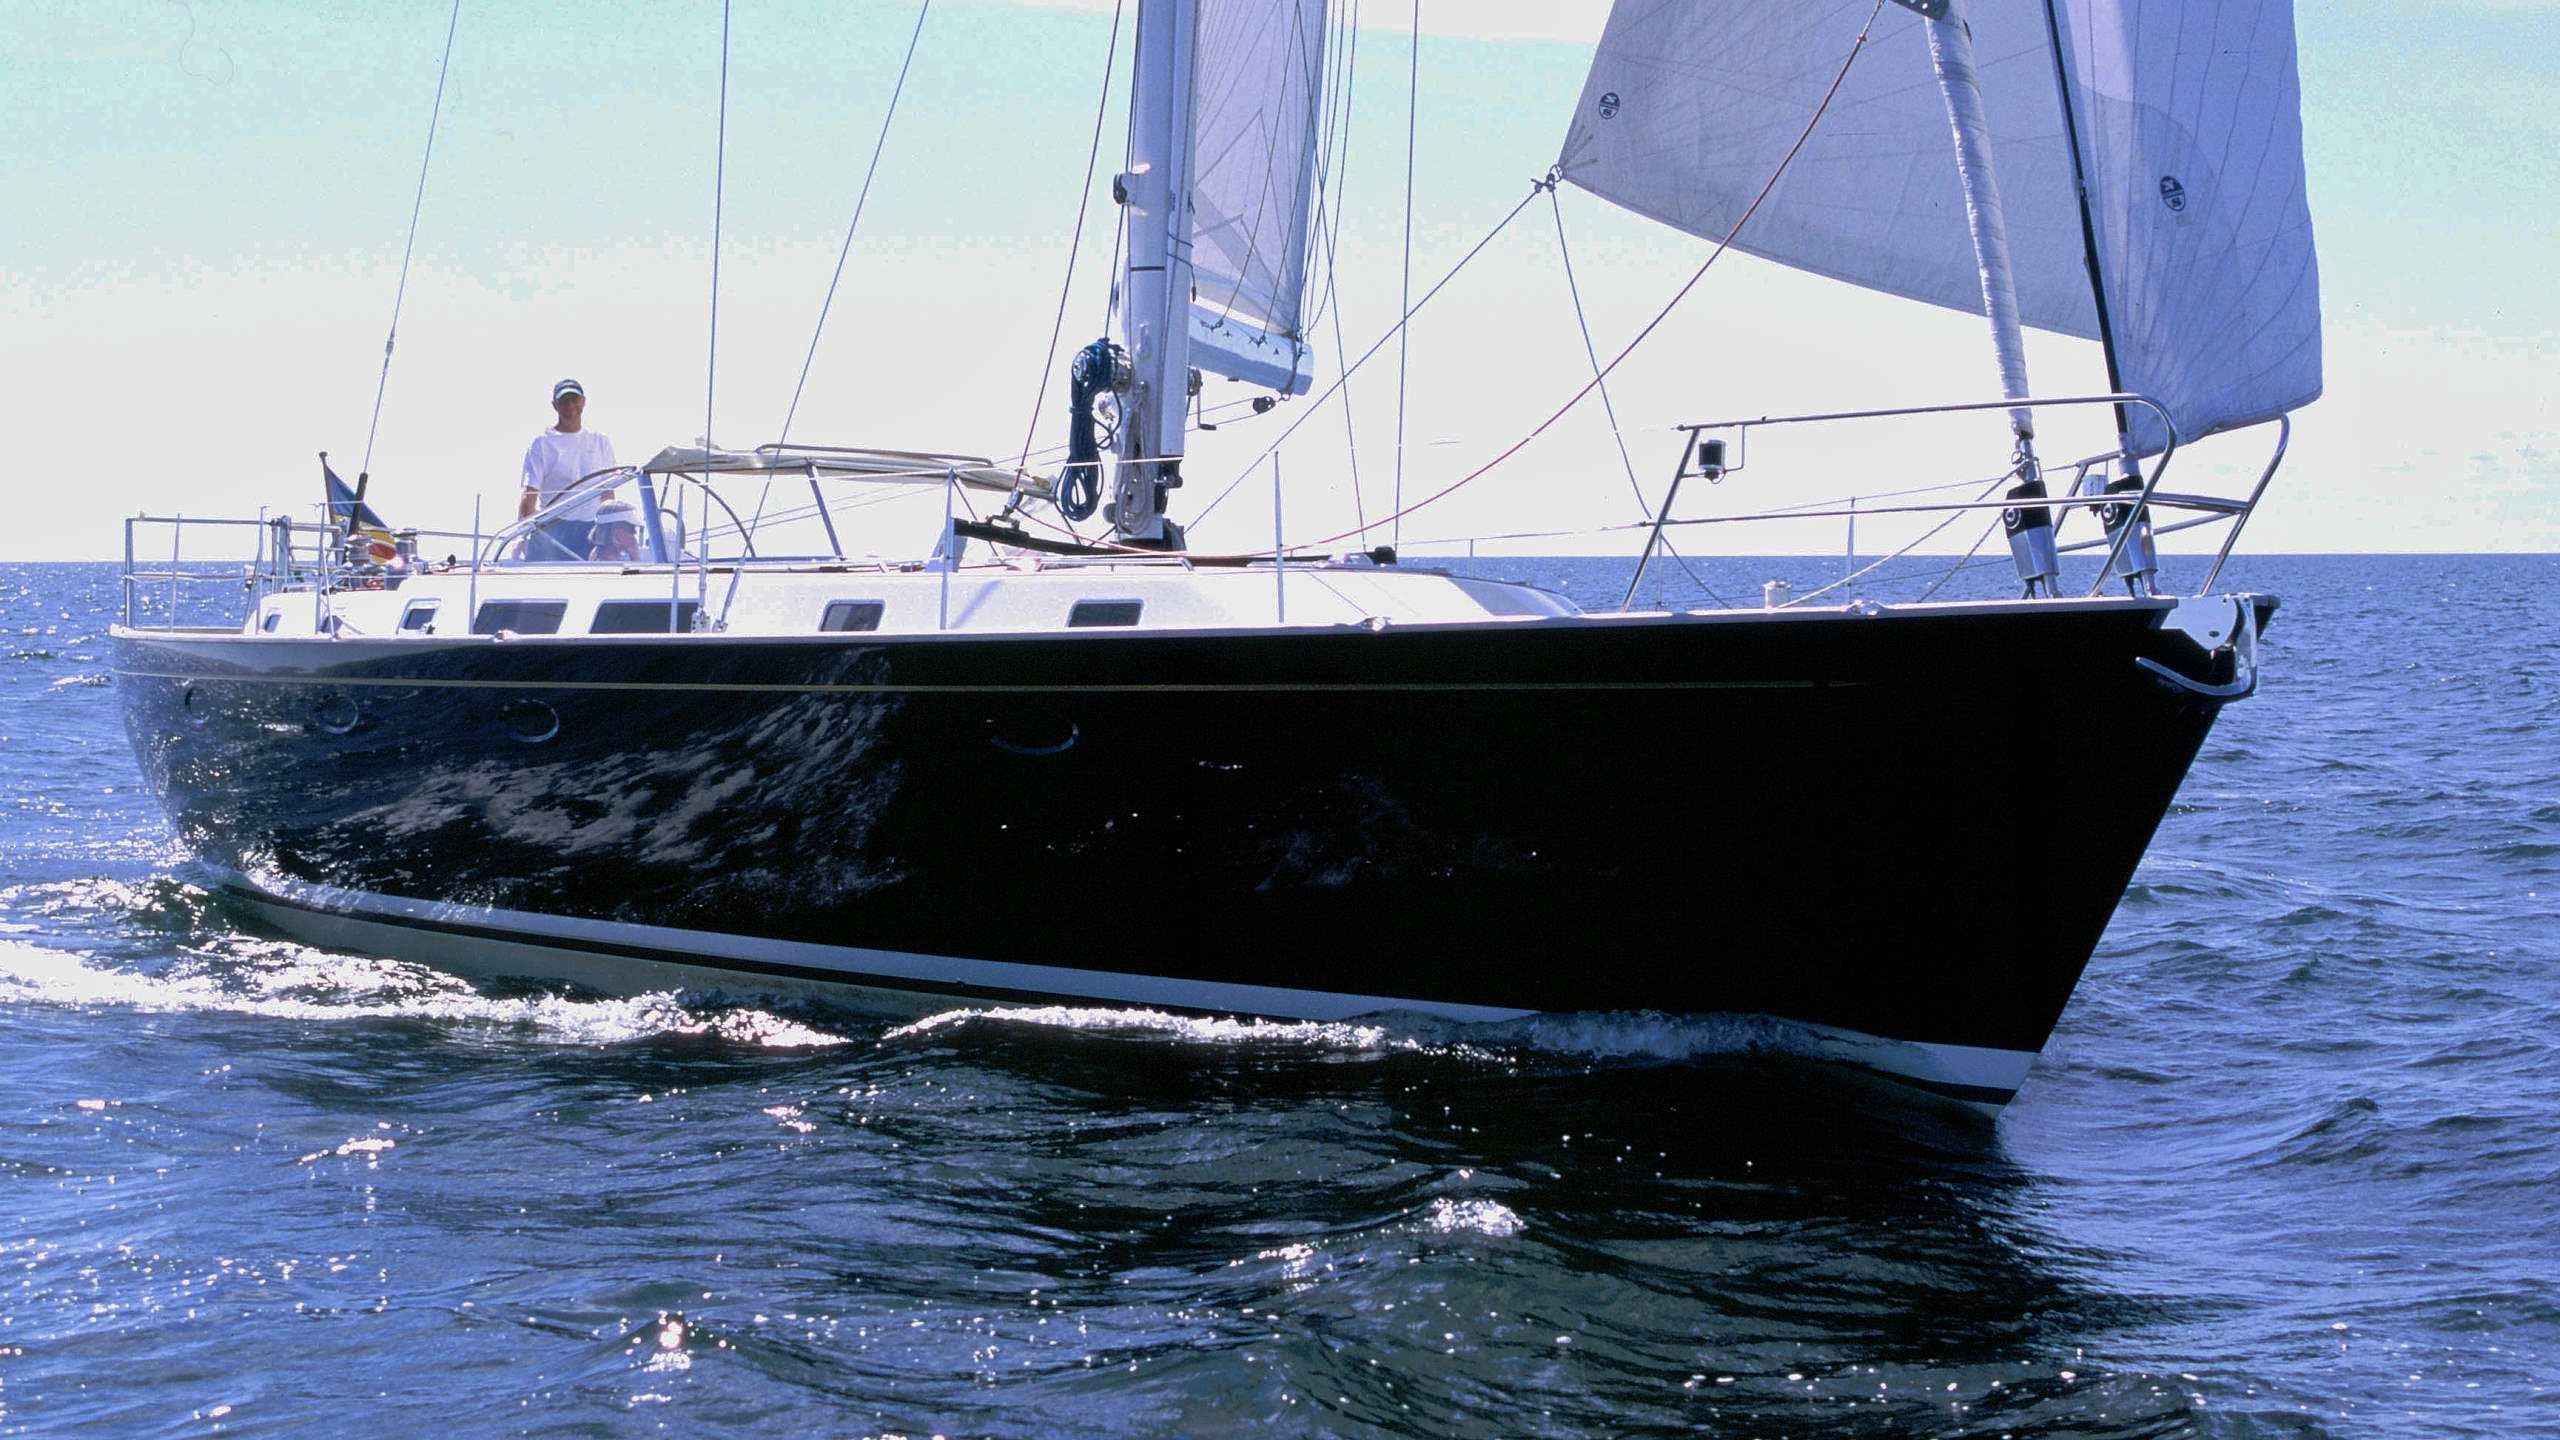 Heyman 57' one-off design